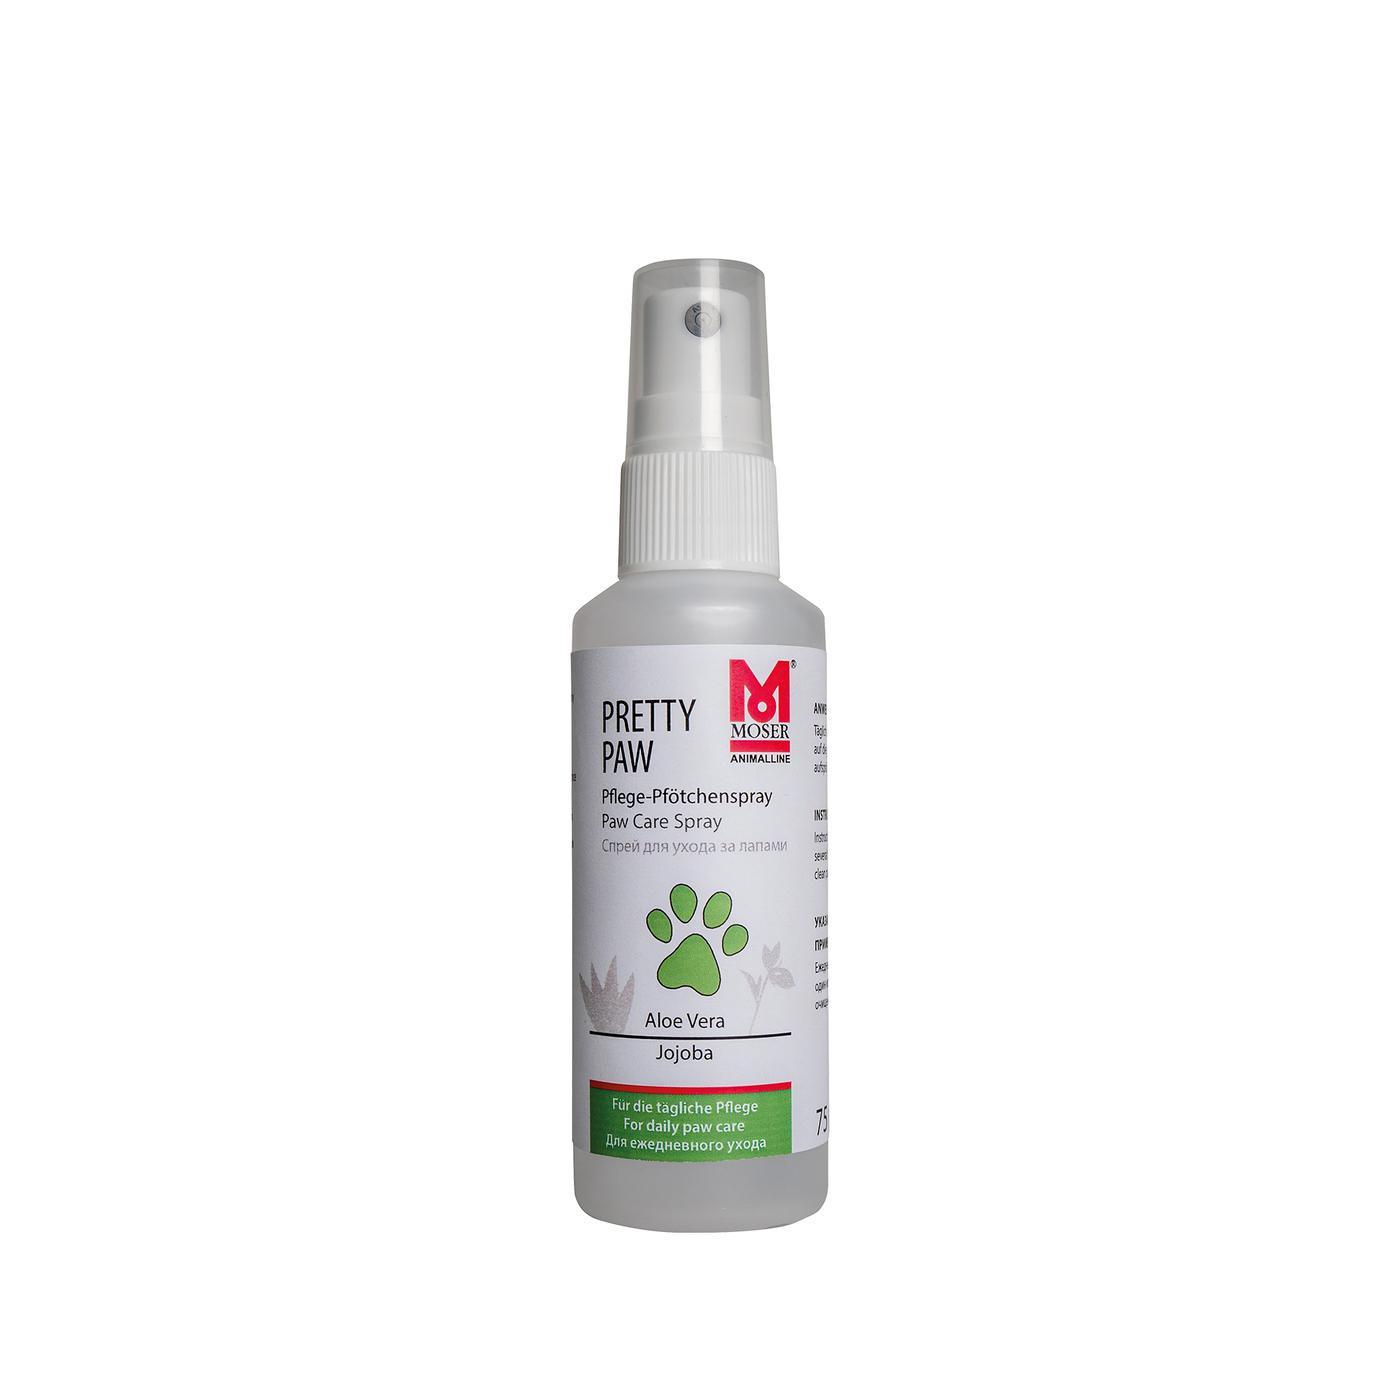 Moser Pfotenpflege-Spray Pretty Paw